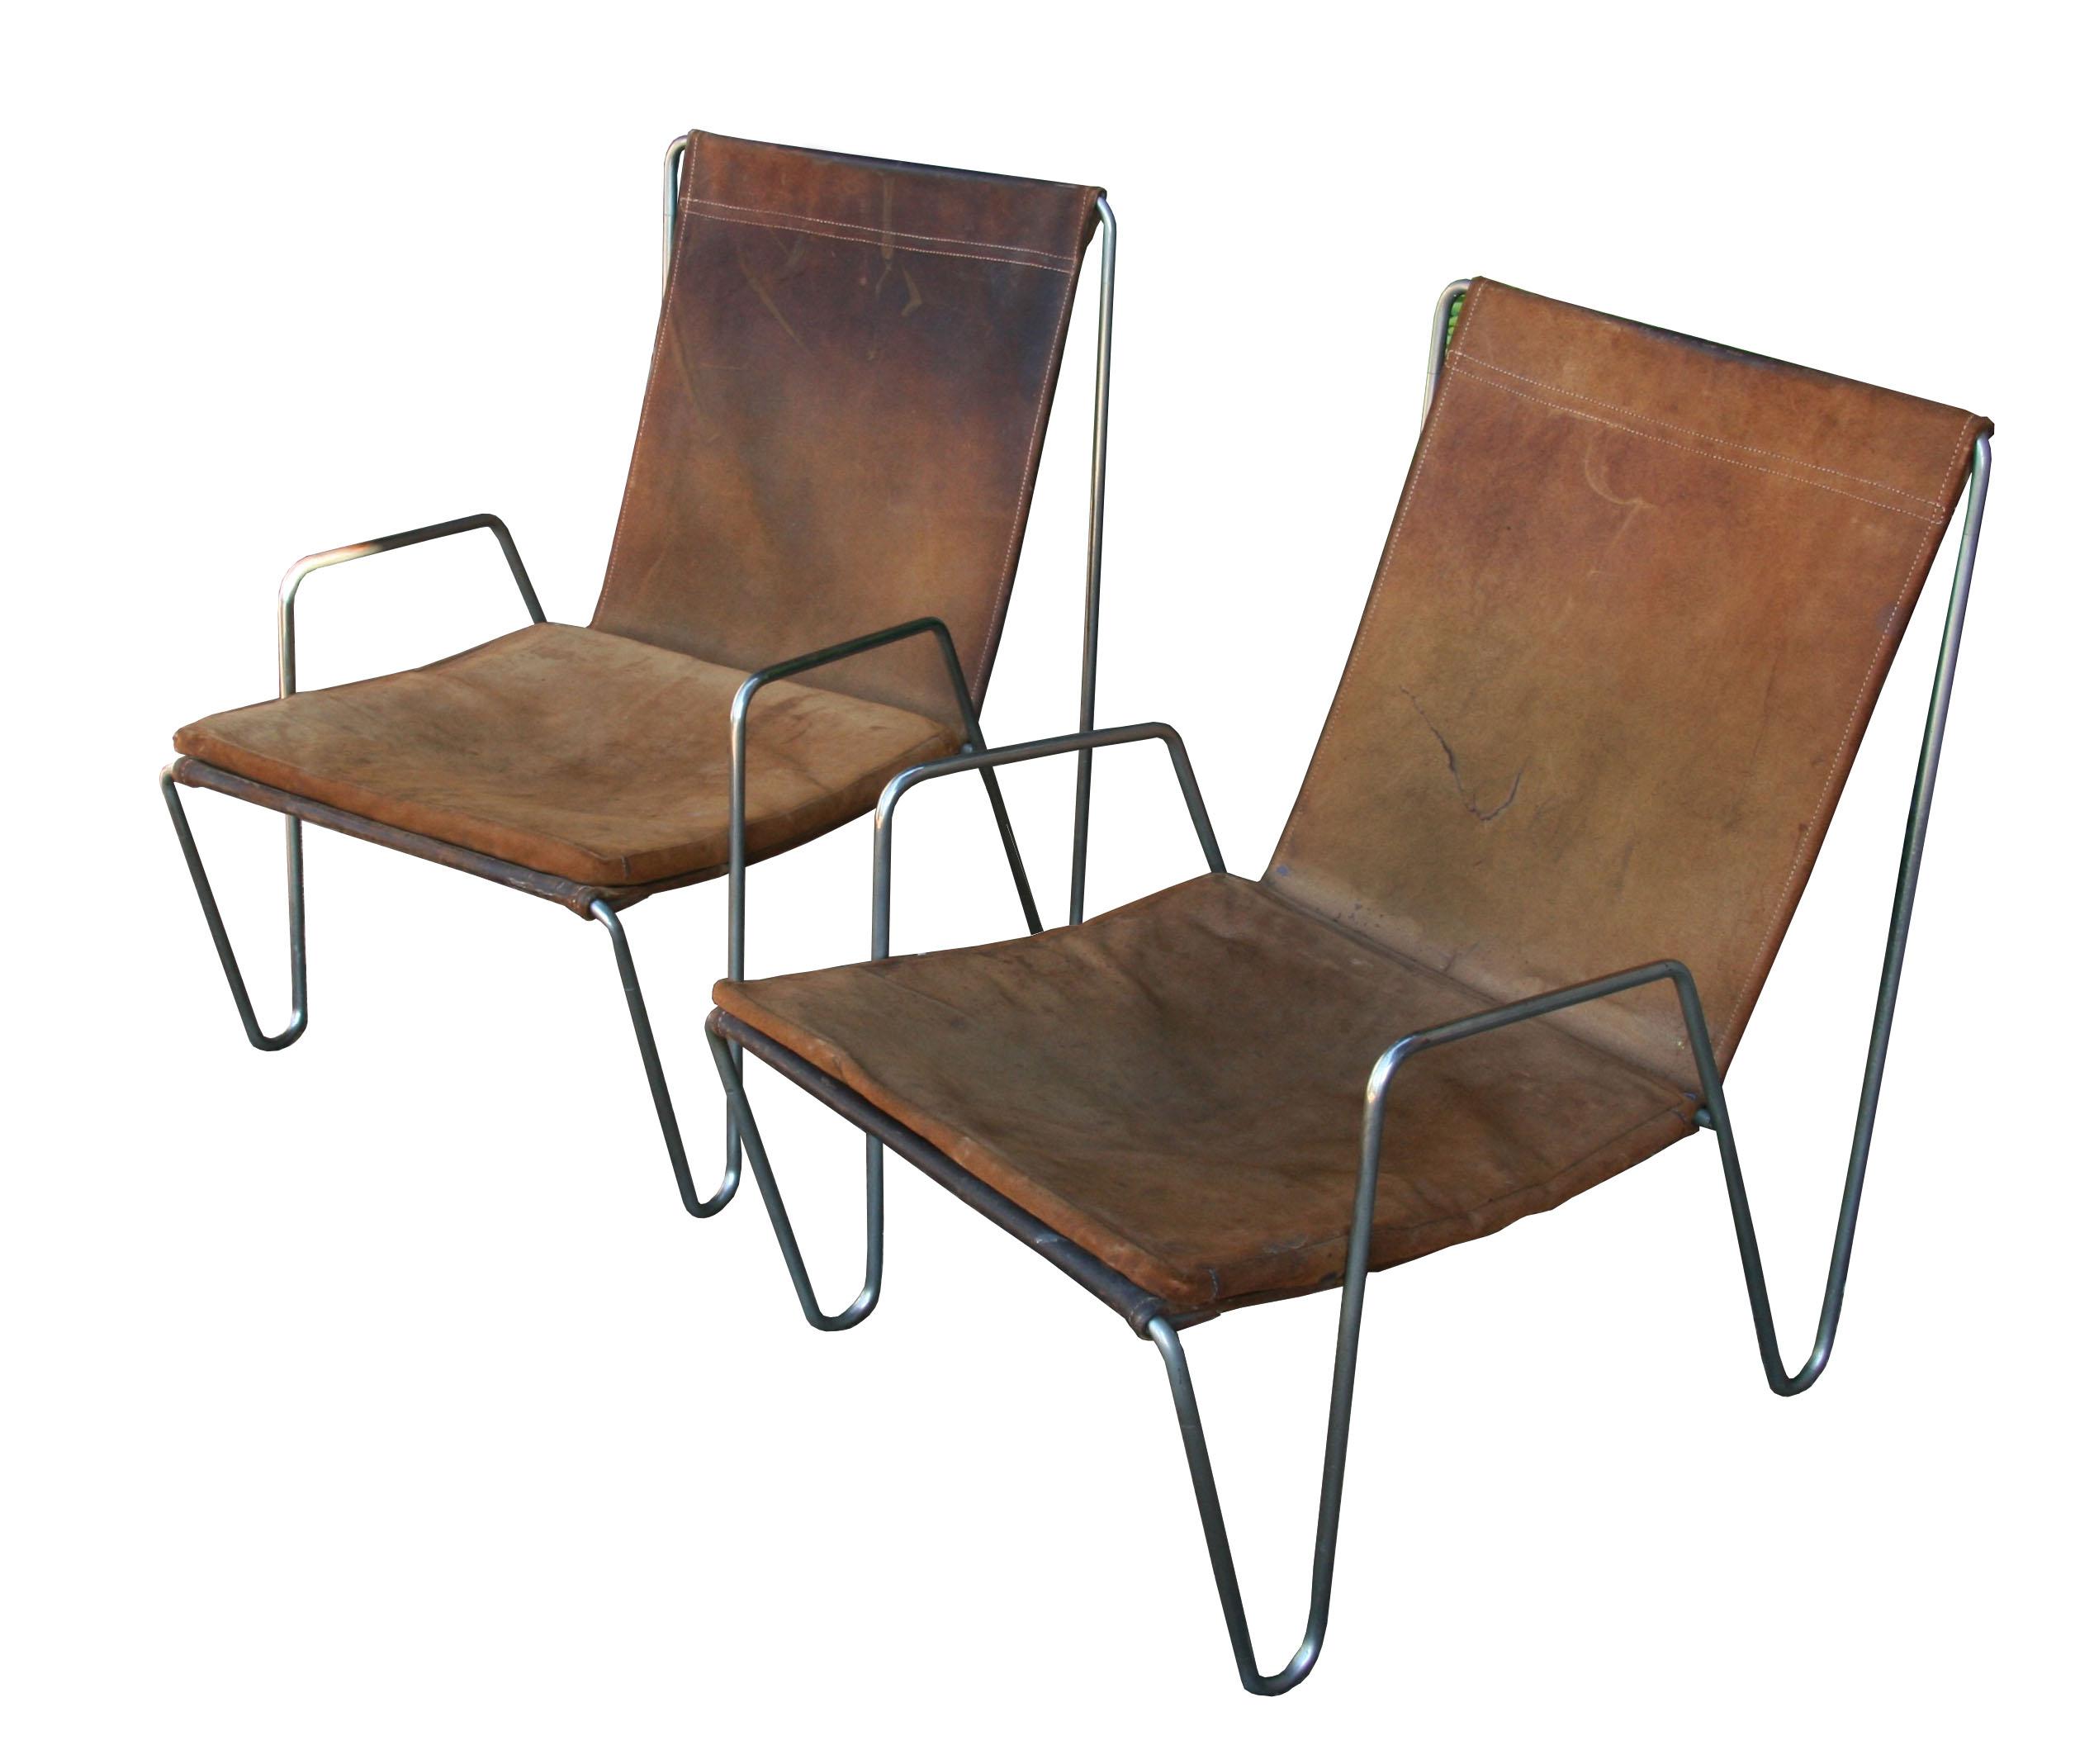 Modern sling chairs - Verner Panton Bachelor Chairs